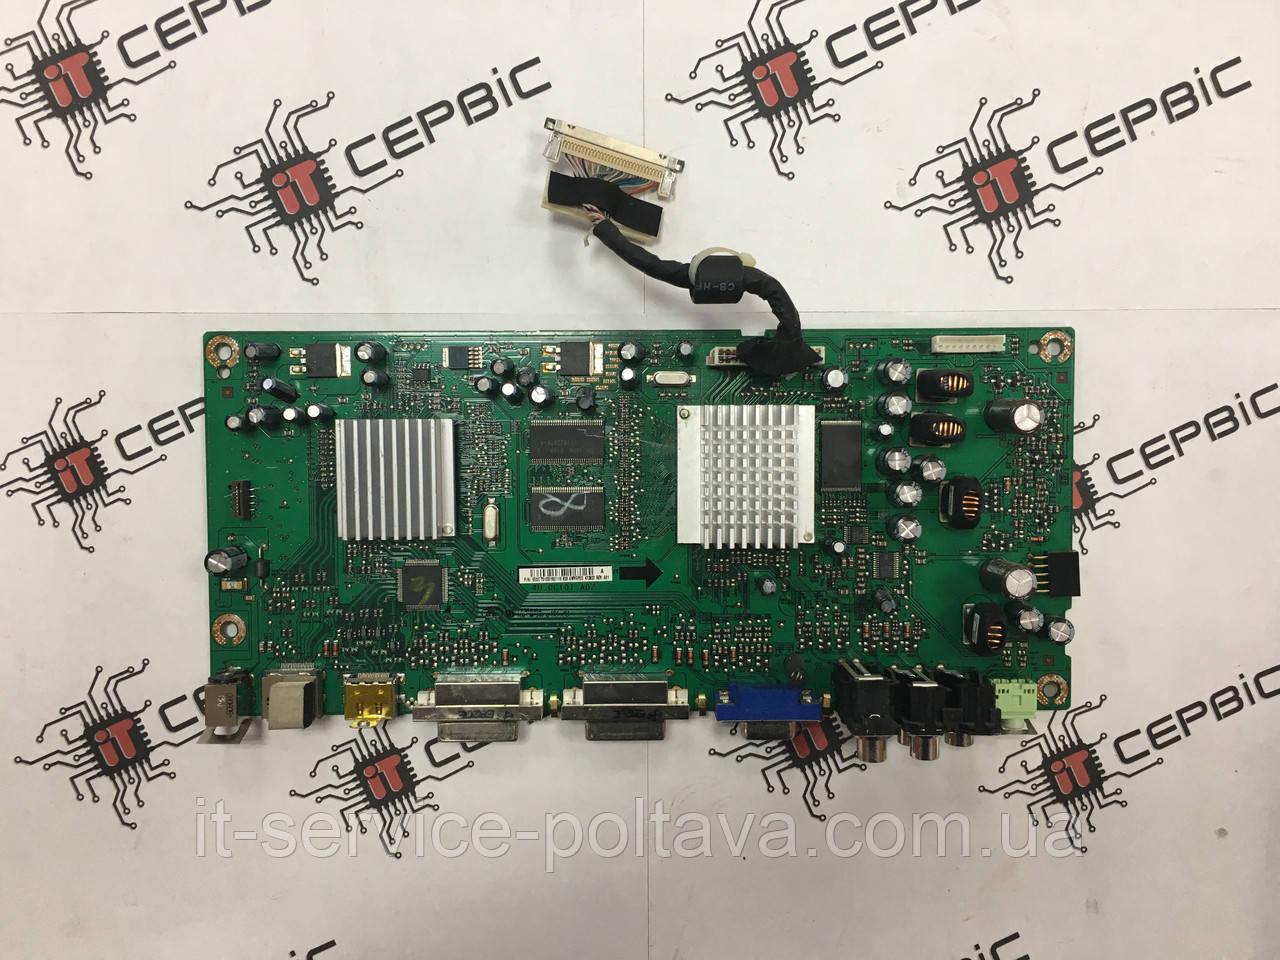 Материнська плата для монітора Dell 2408wfpb Main Video Board 4h.0ct01.a02 2408wfp LCD Monitor Screen Display